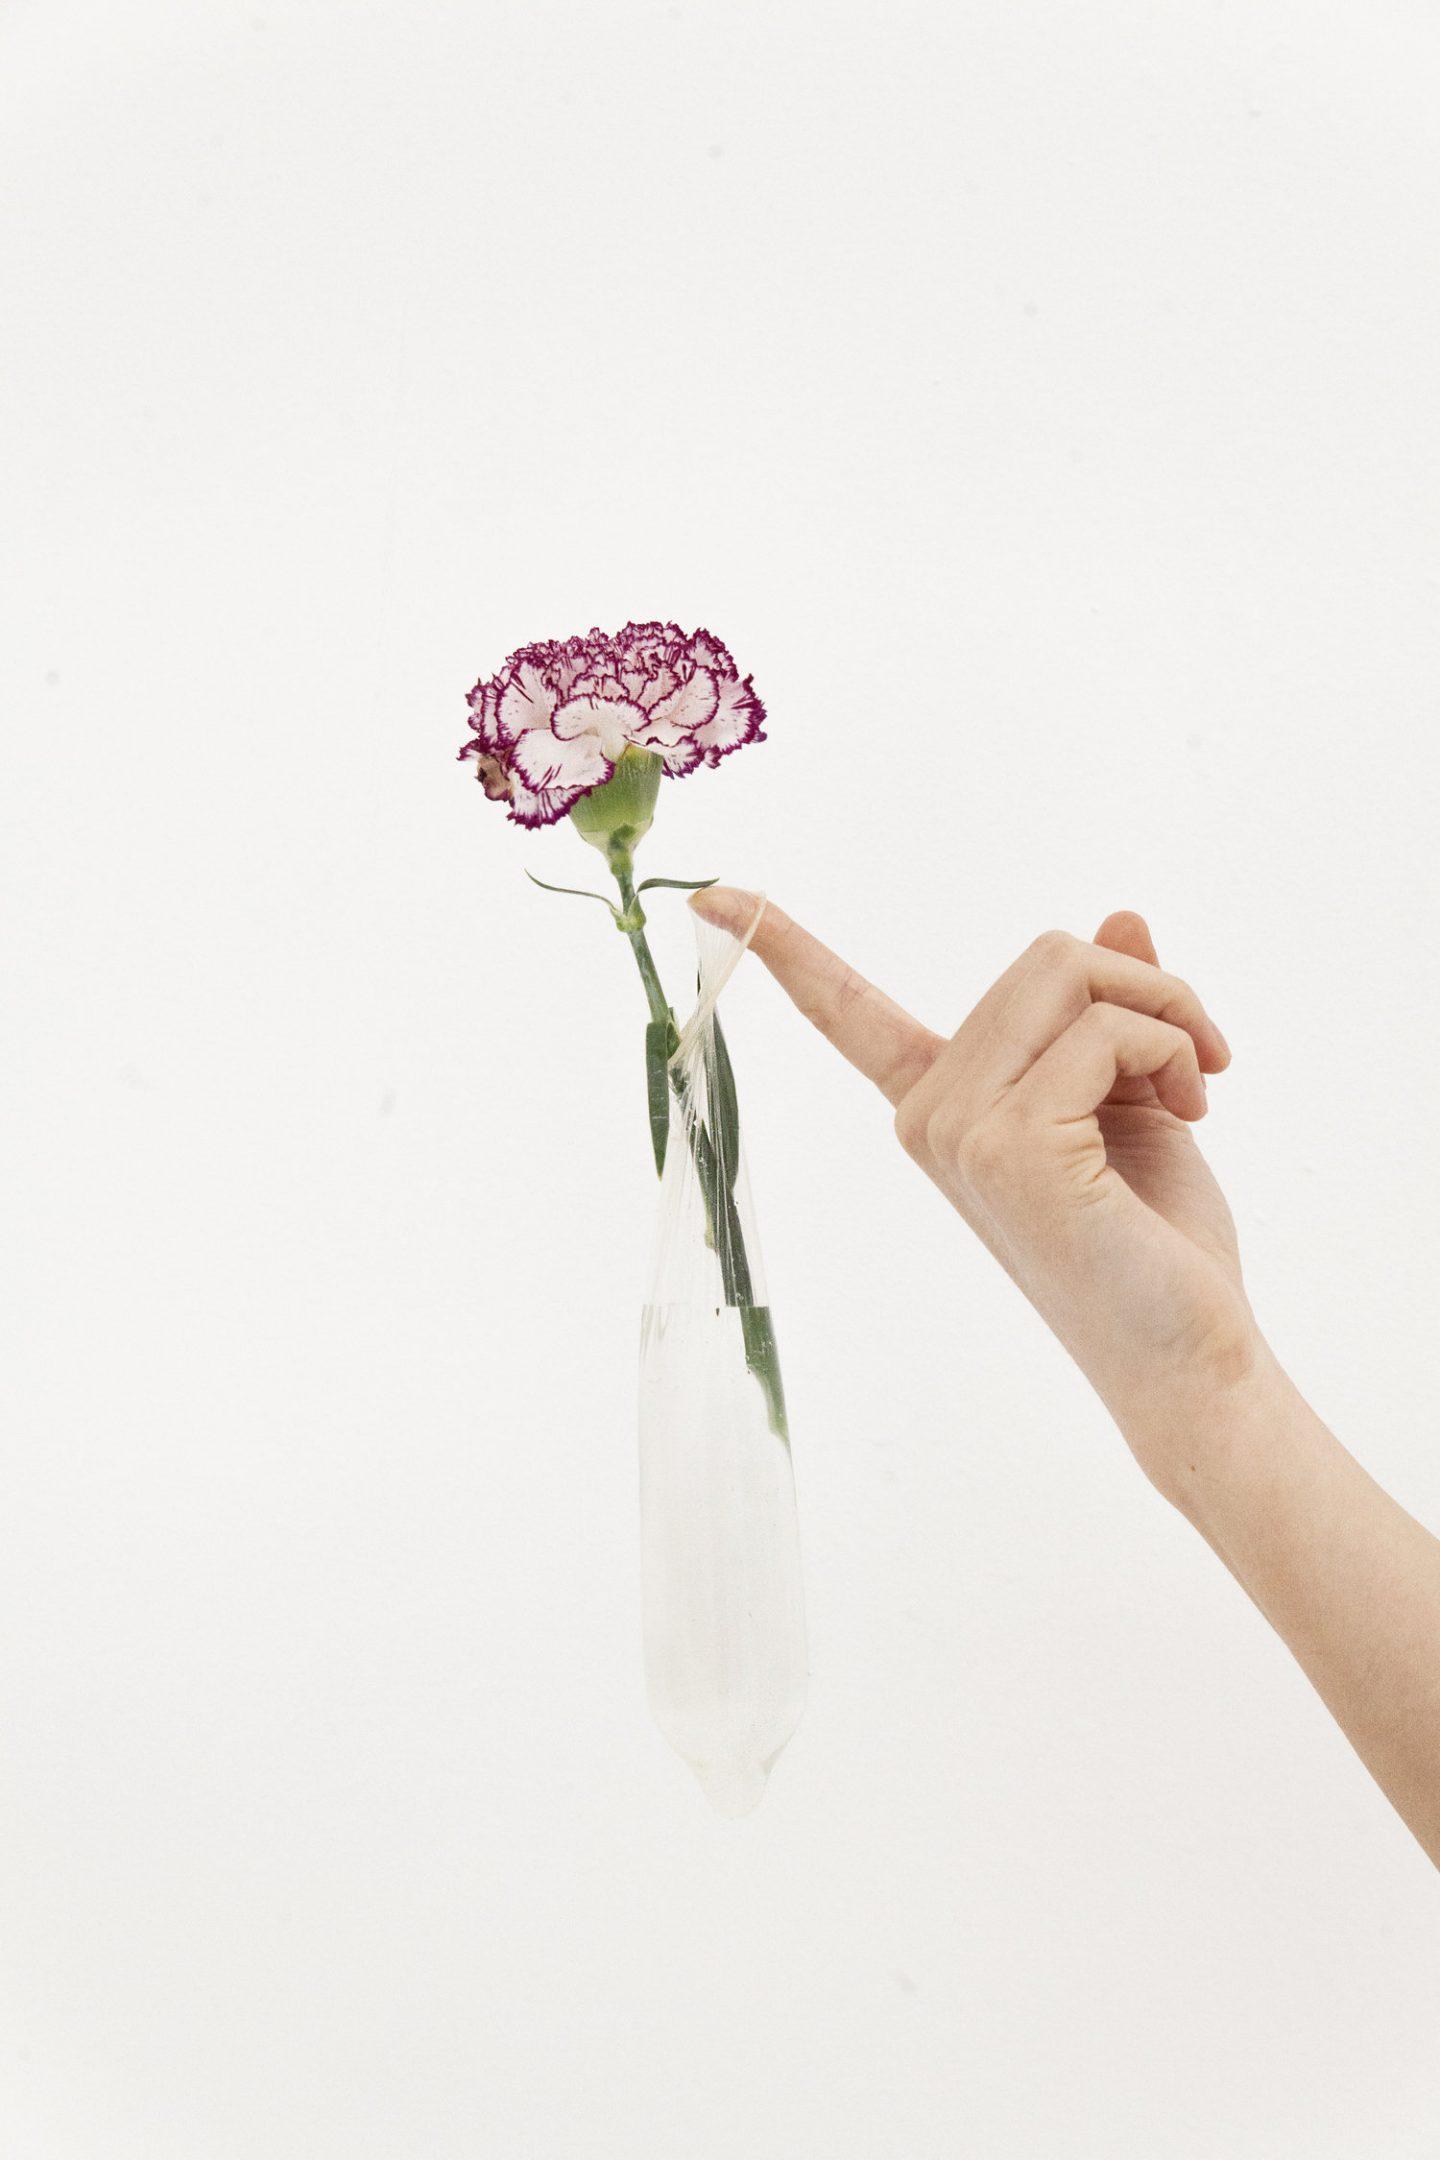 iGNANT-Photography-Adriana-Roslin-20